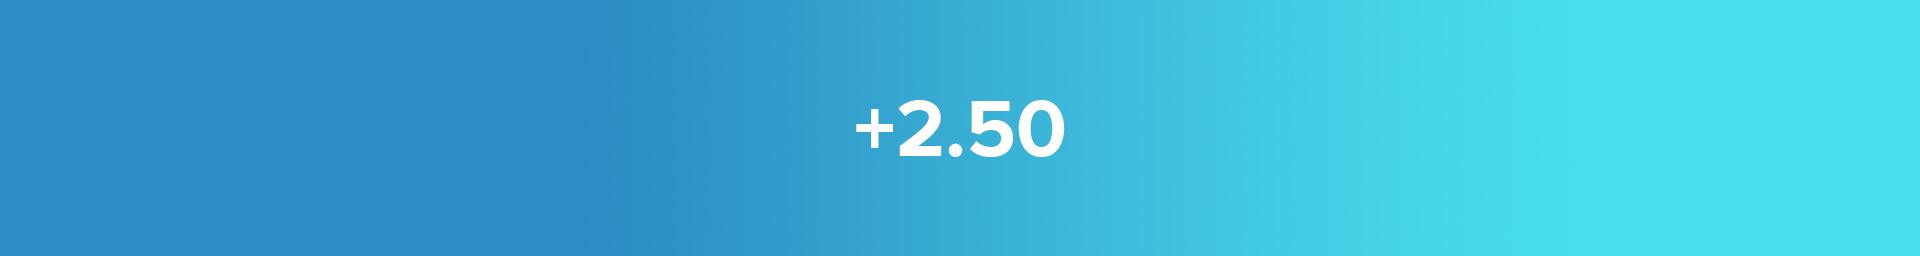 +2.50